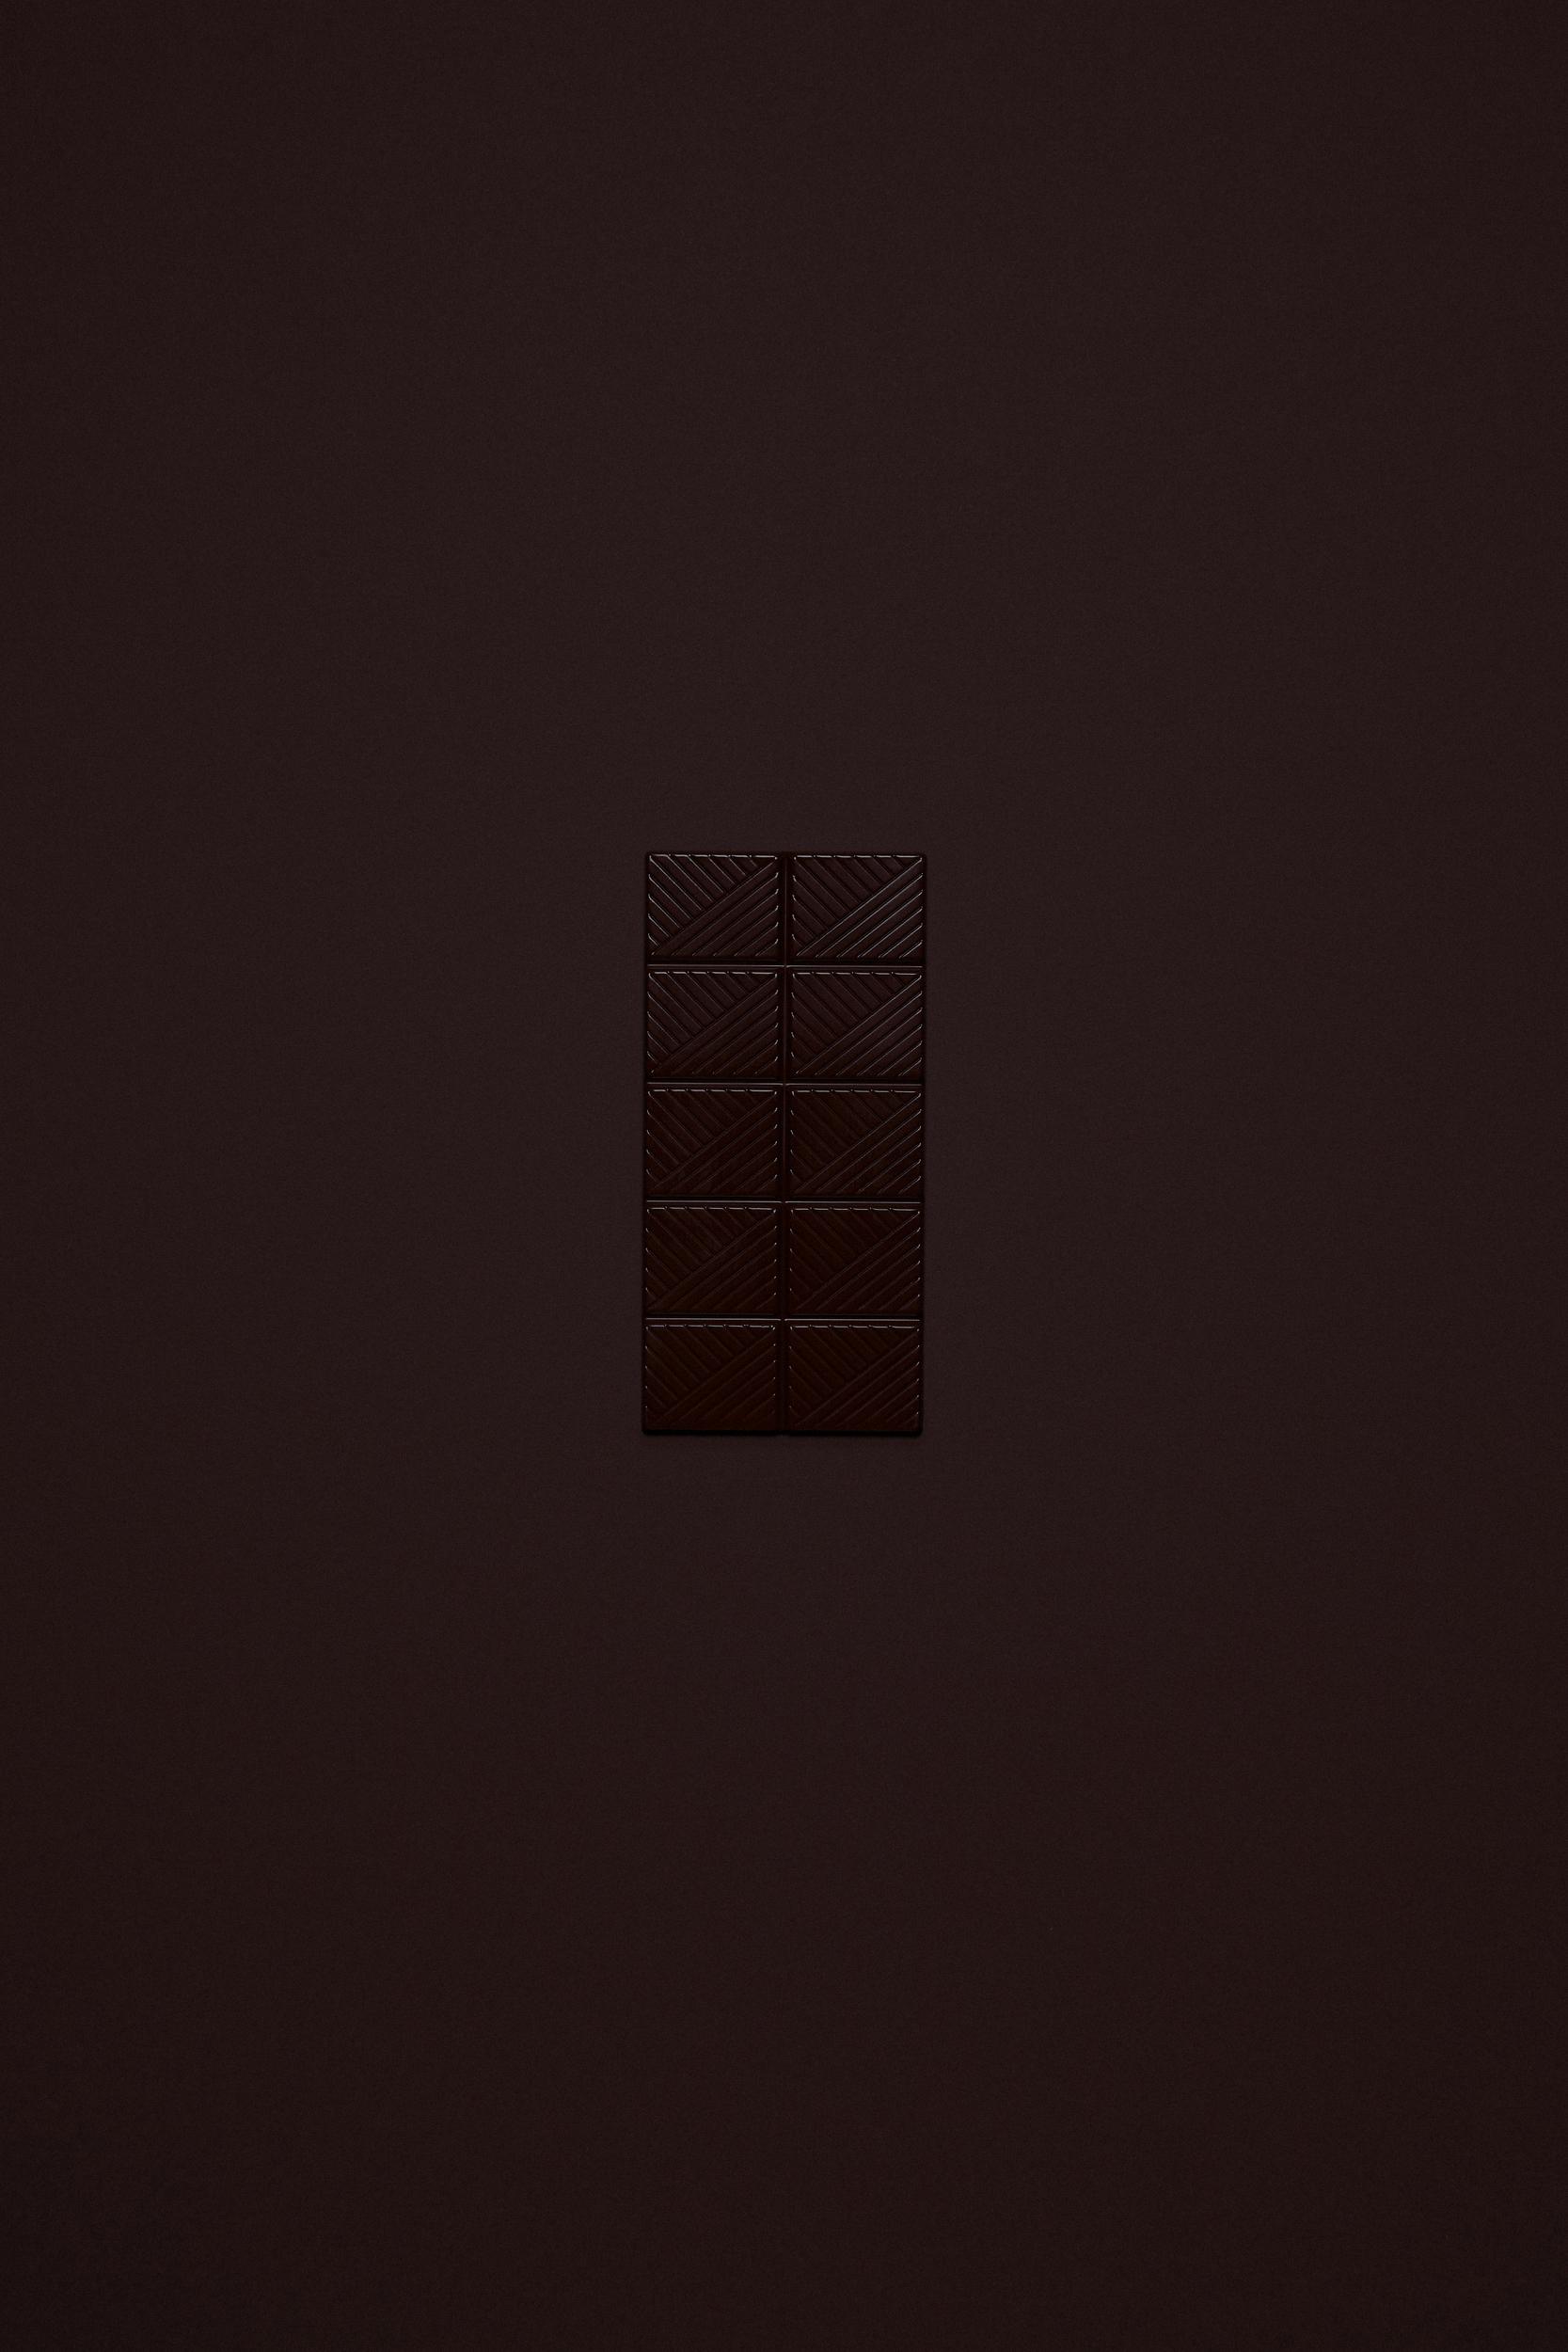 ColorPlan_Bitter_Chocolade_1.jpg